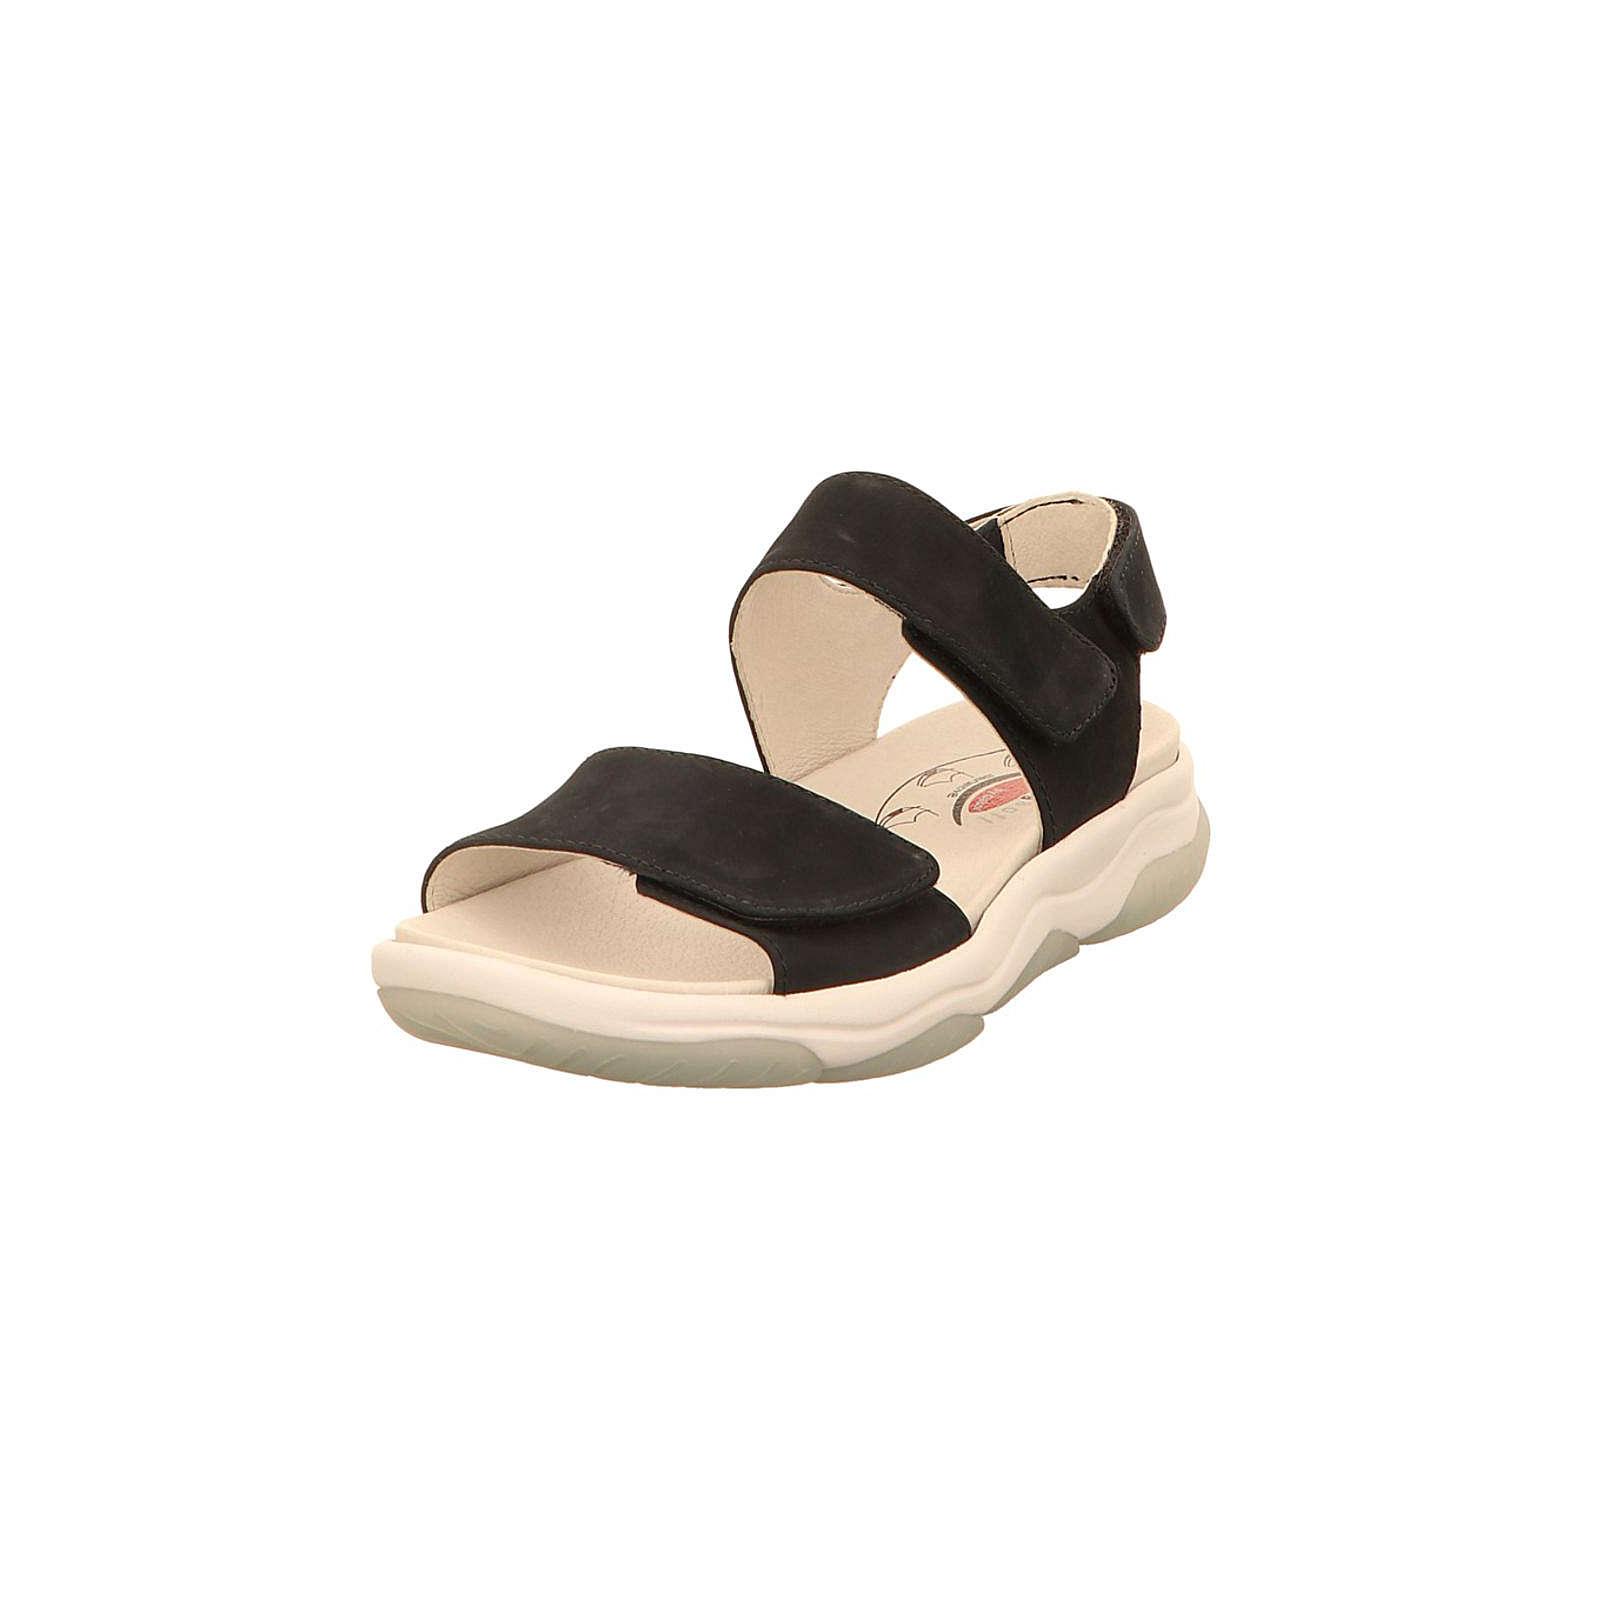 Gabor Klassische Sandalen schwarz Damen Gr. 39